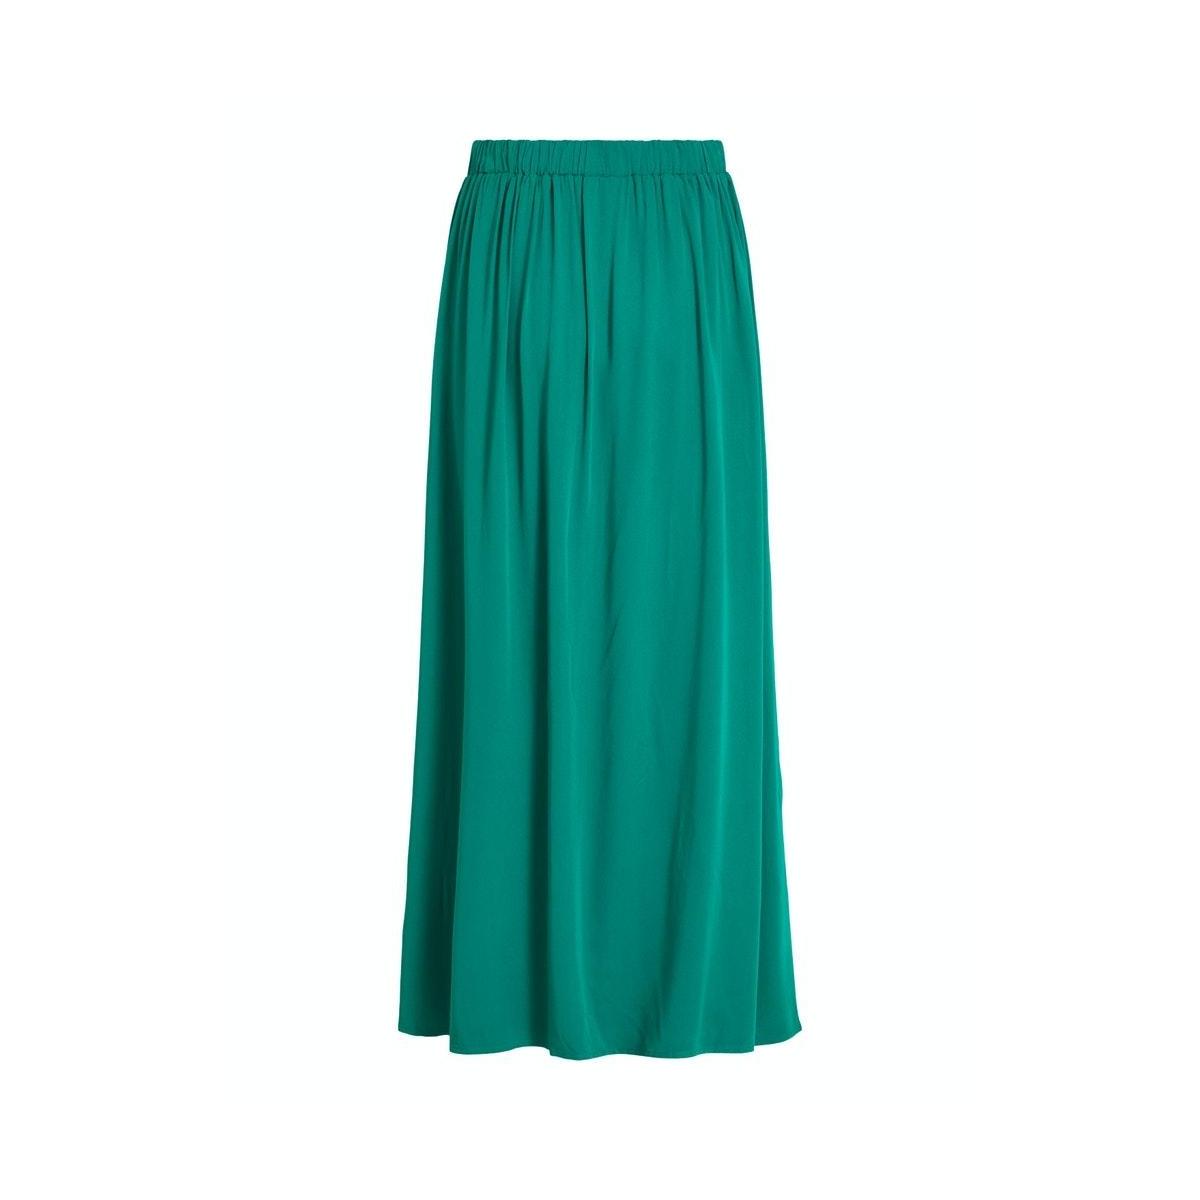 visuvita hw ancle skirt/su 14057641 vila rok ultramarine green